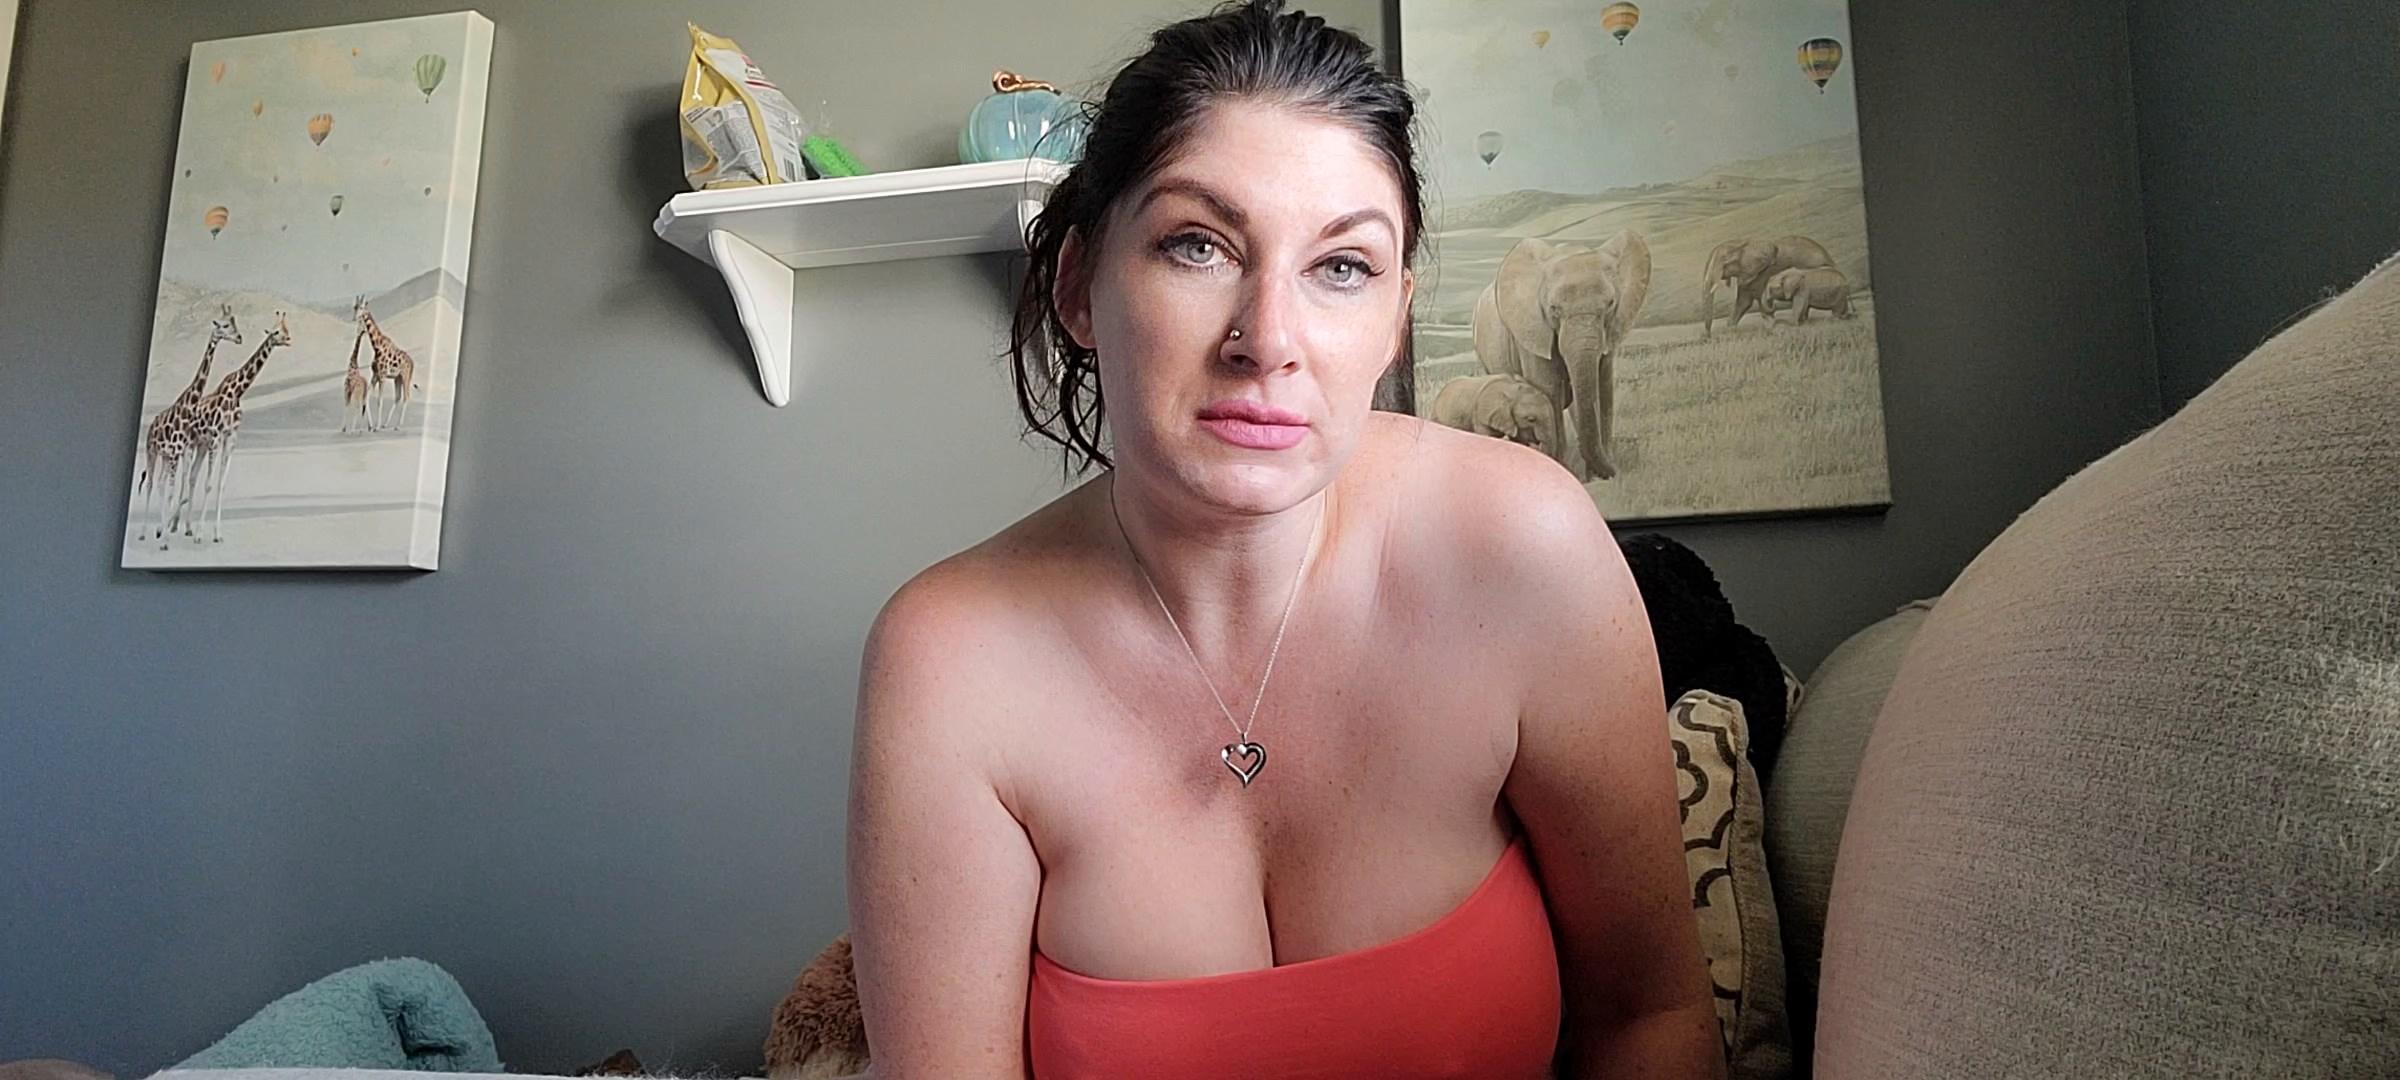 Mizz Erotique - Mommy Loves Your Little Cock